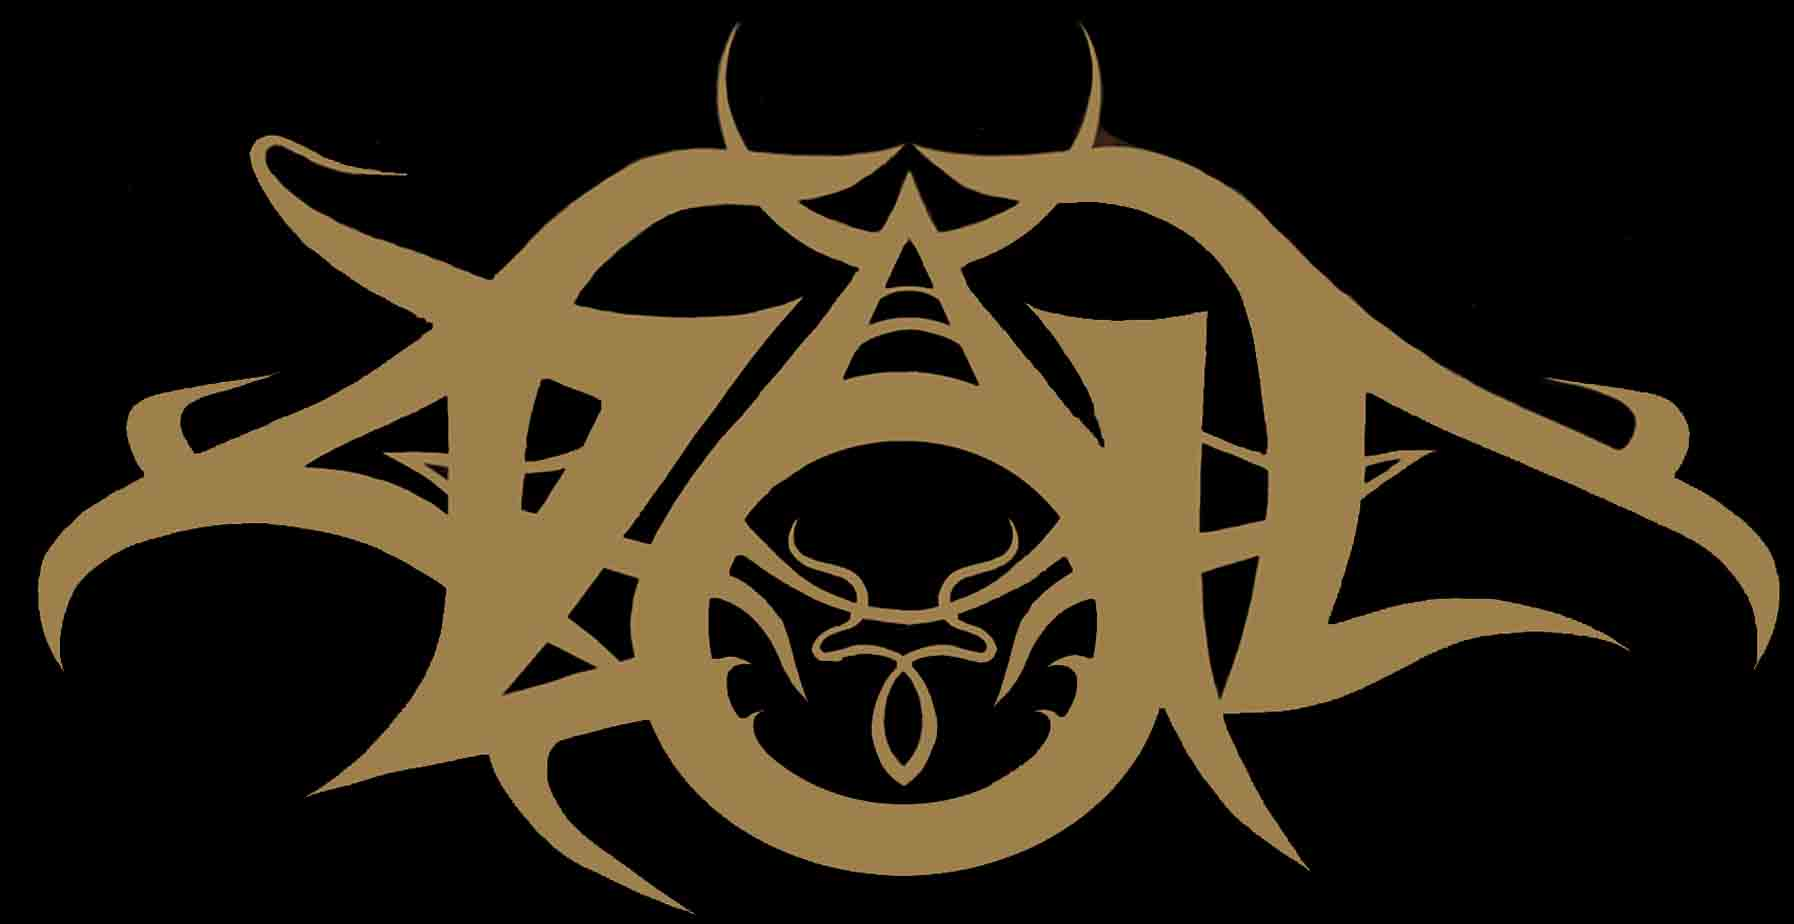 Azoic - Logo